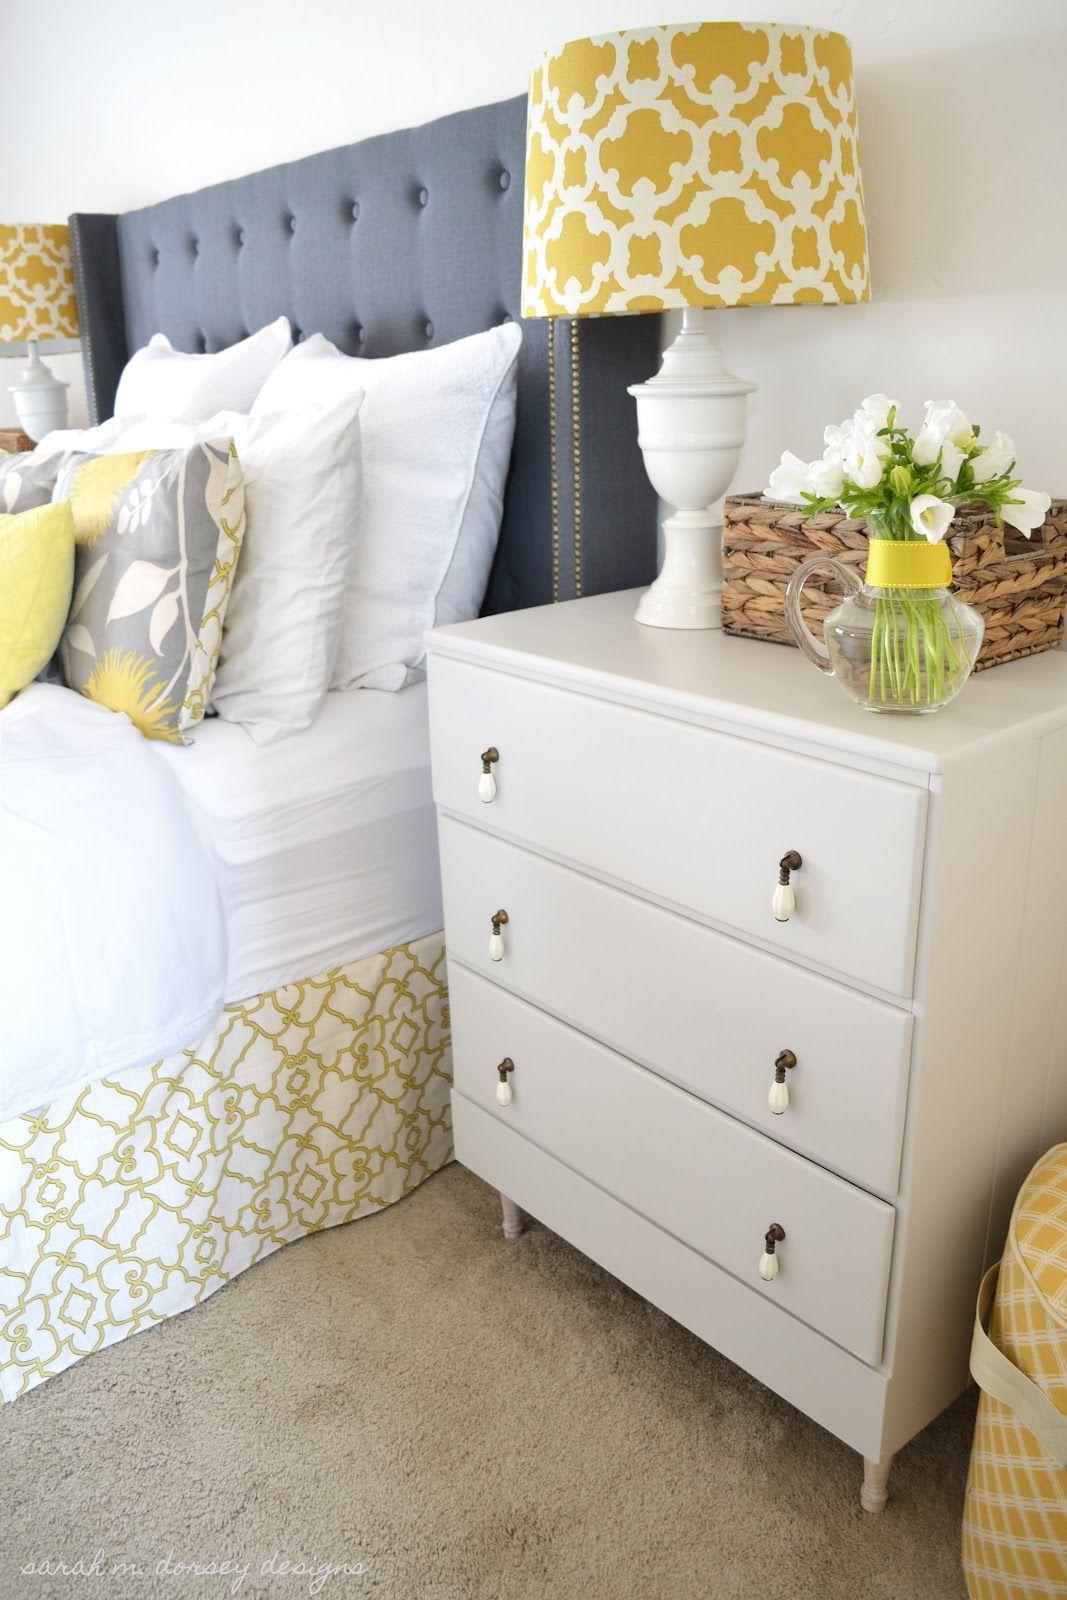 Master bedroom nightstand decor  sarah m dorsey designs Second Dresser  Nightstand Finished